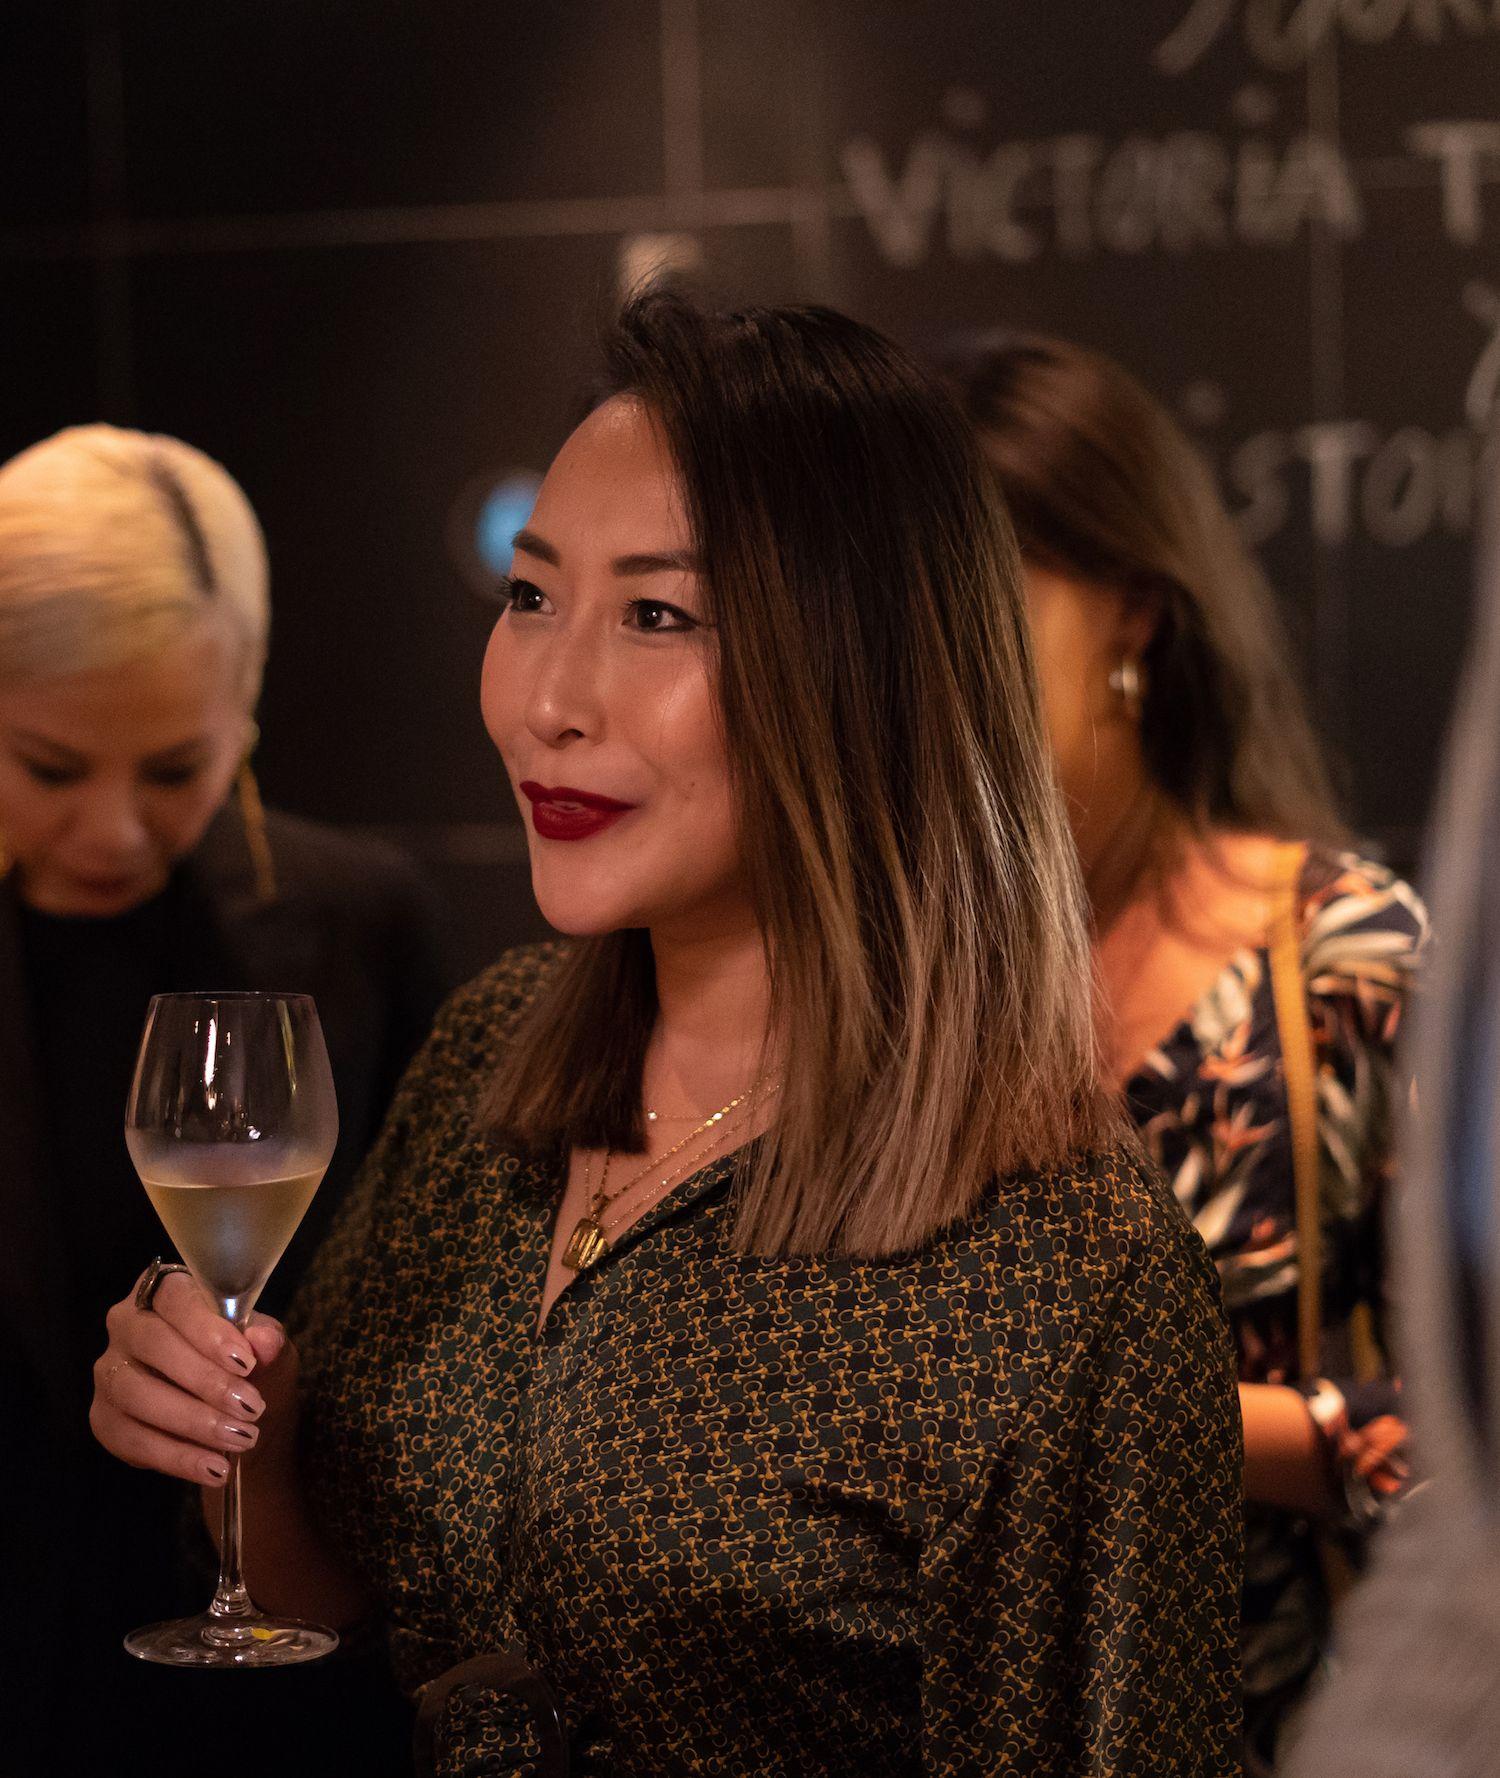 Jessi Chloe Chen